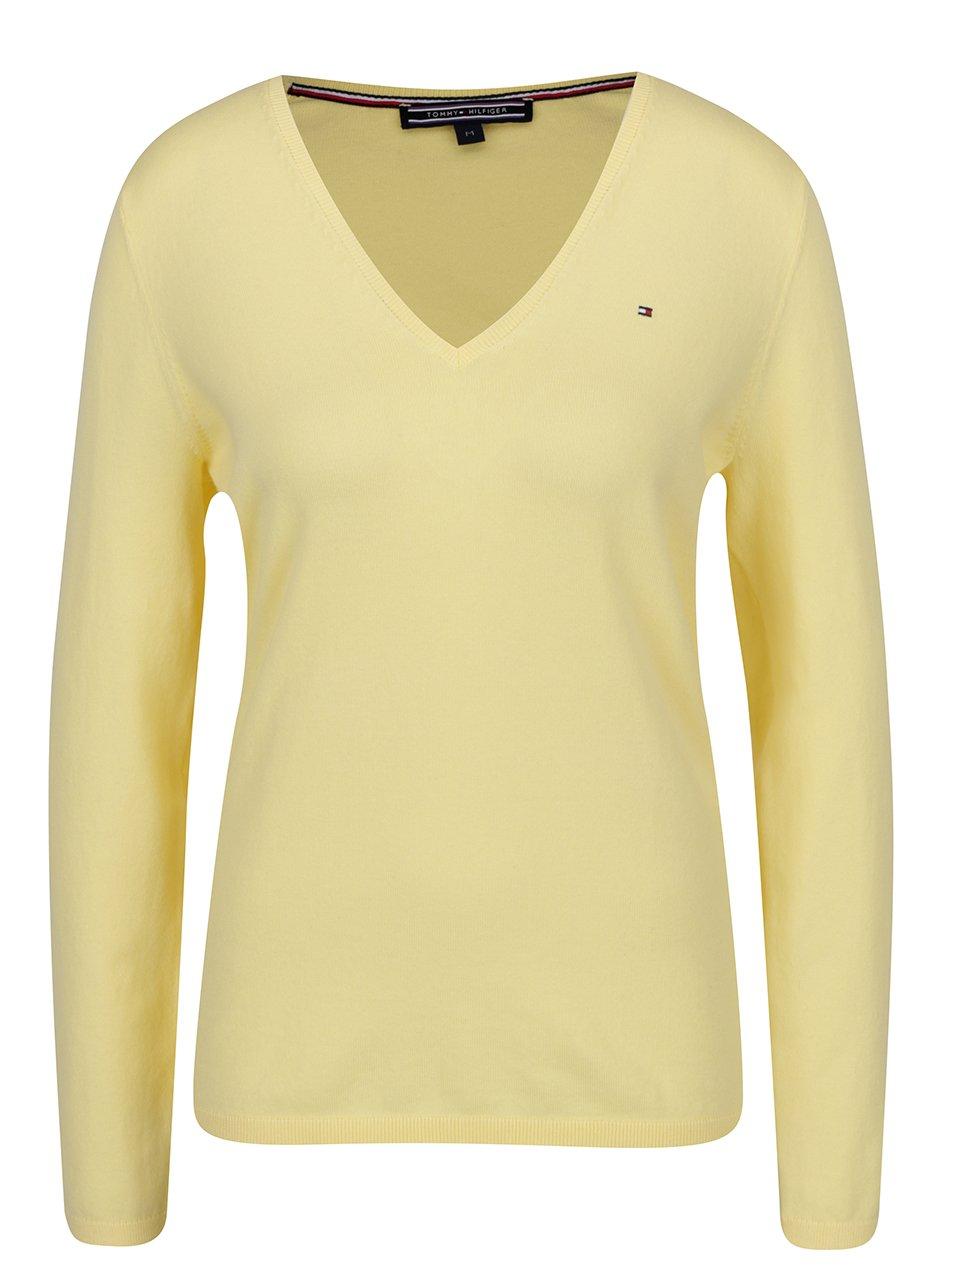 Žlutý dámský lehký svetr Tommy Hilfiger